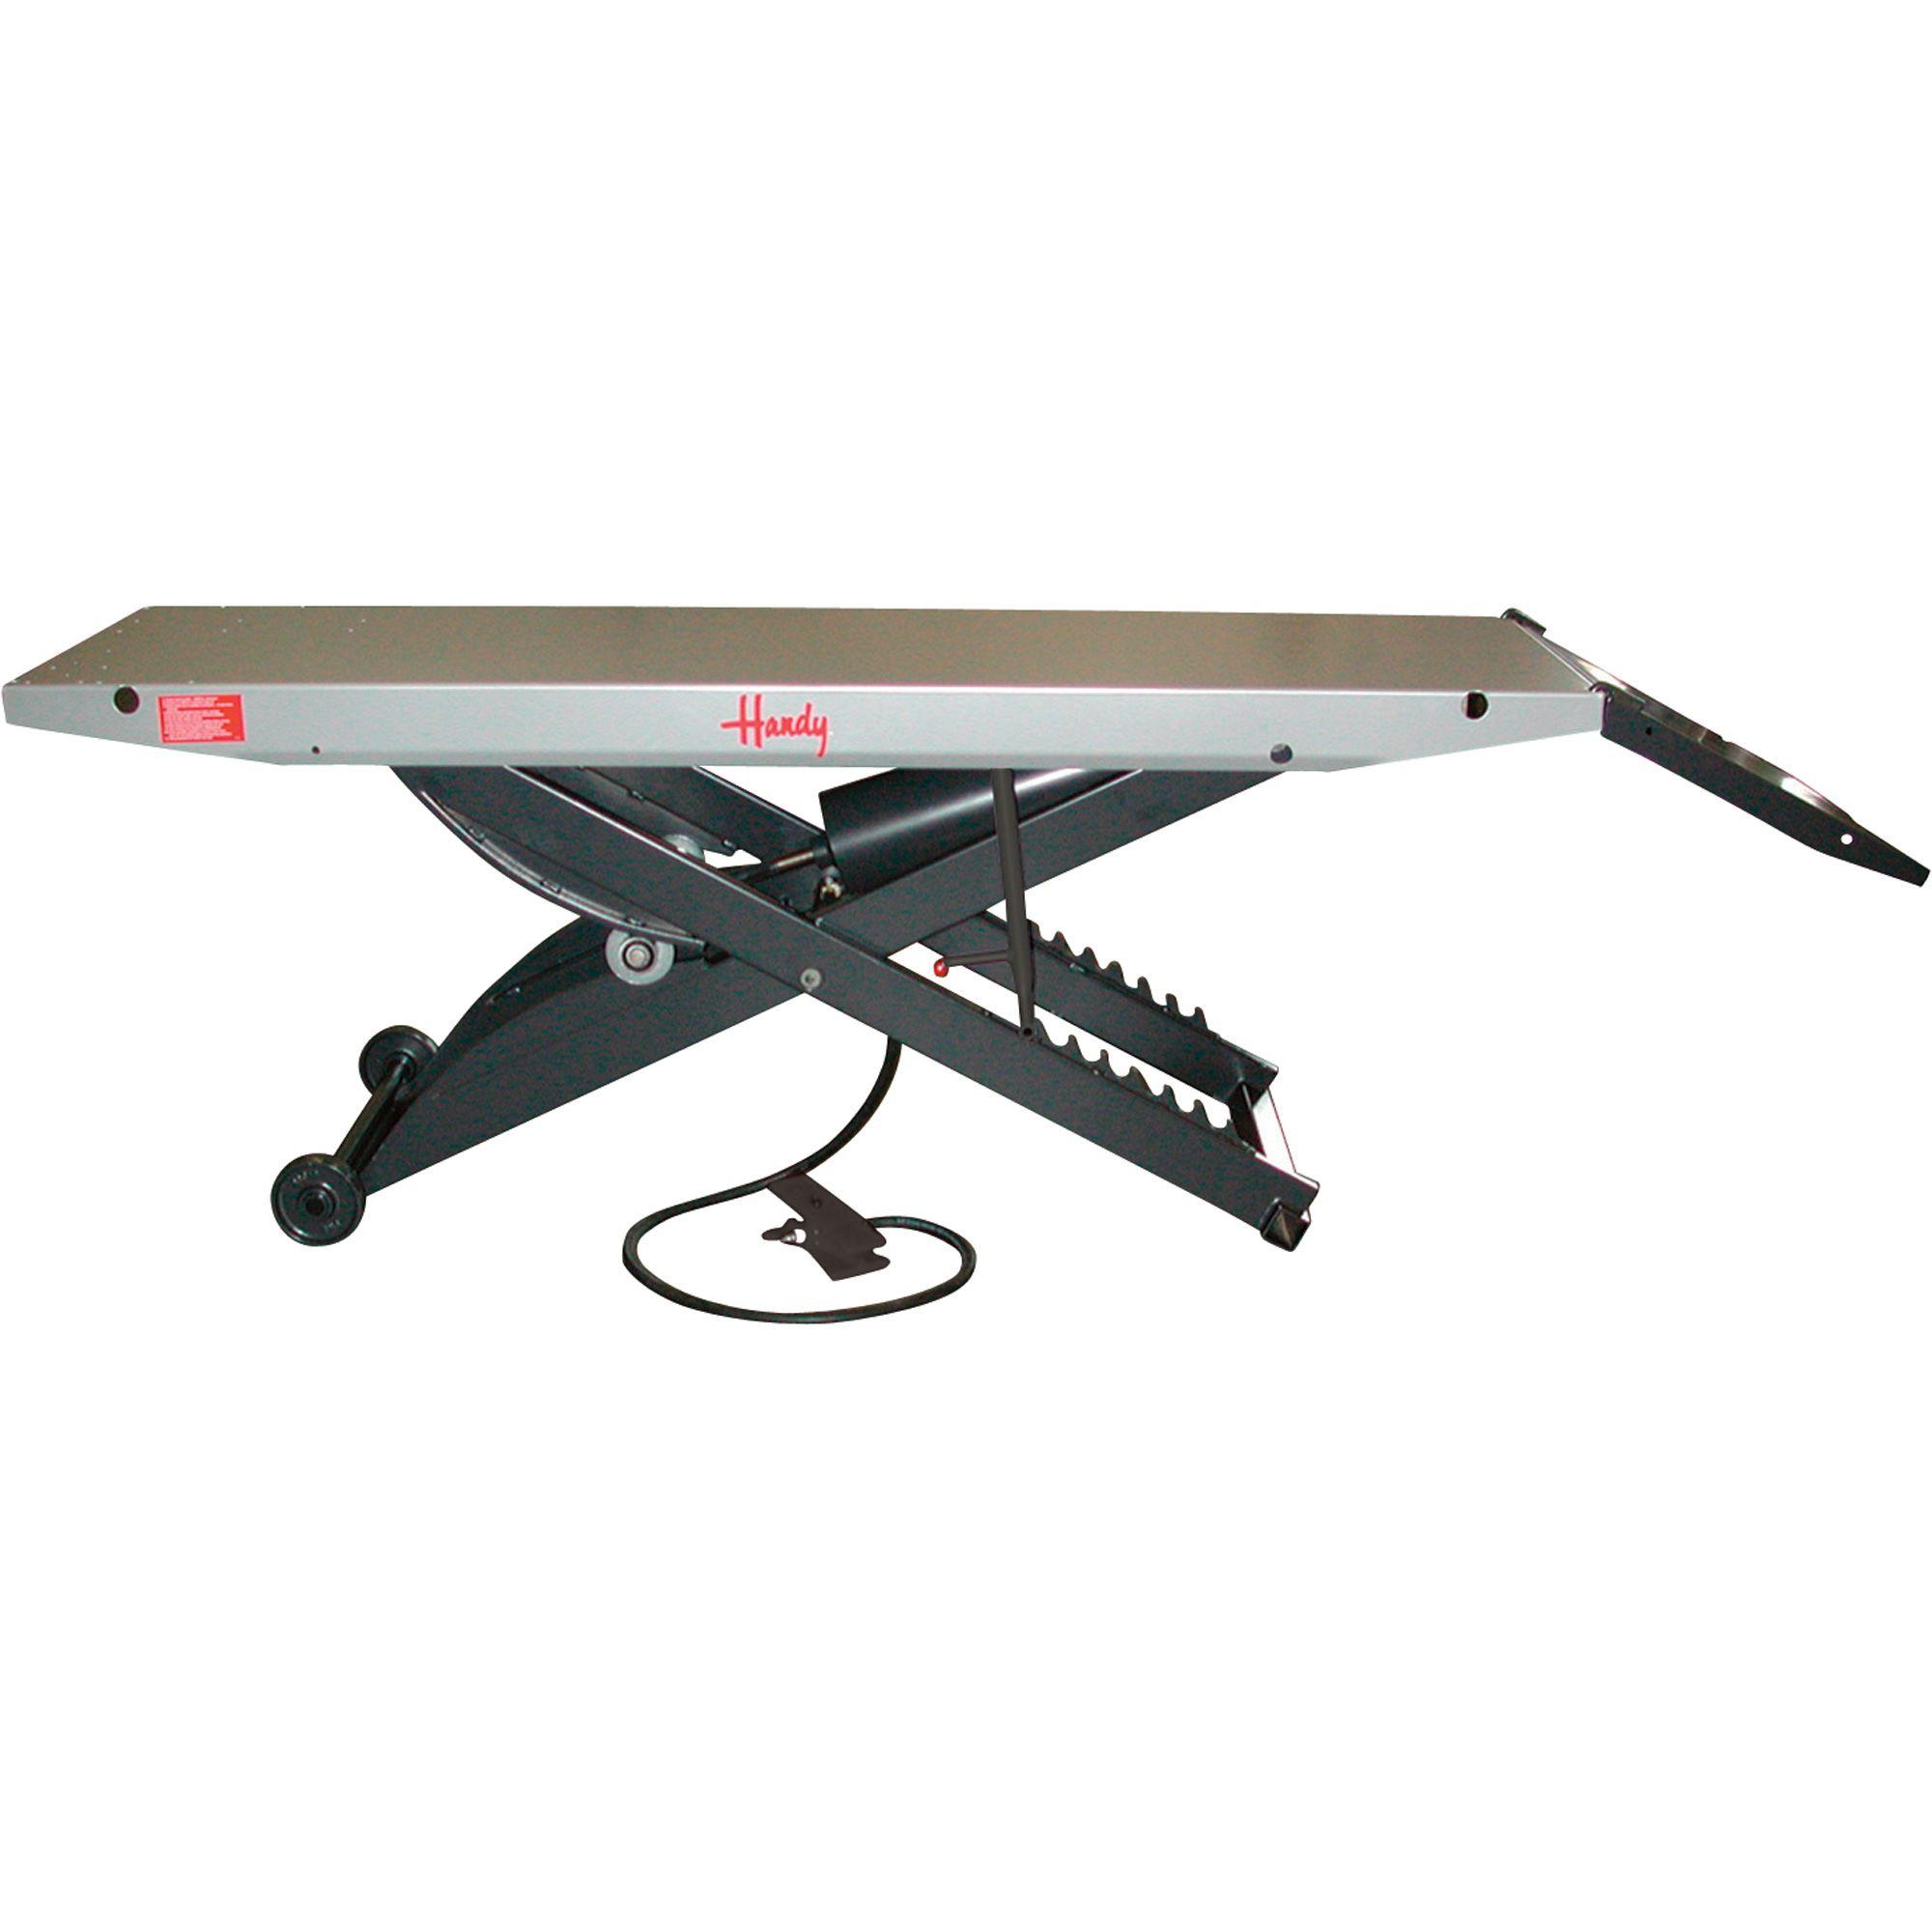 Charming Handy Air Lift Table U2014 1000 Lb. Capacity, Model# 10740   ATV